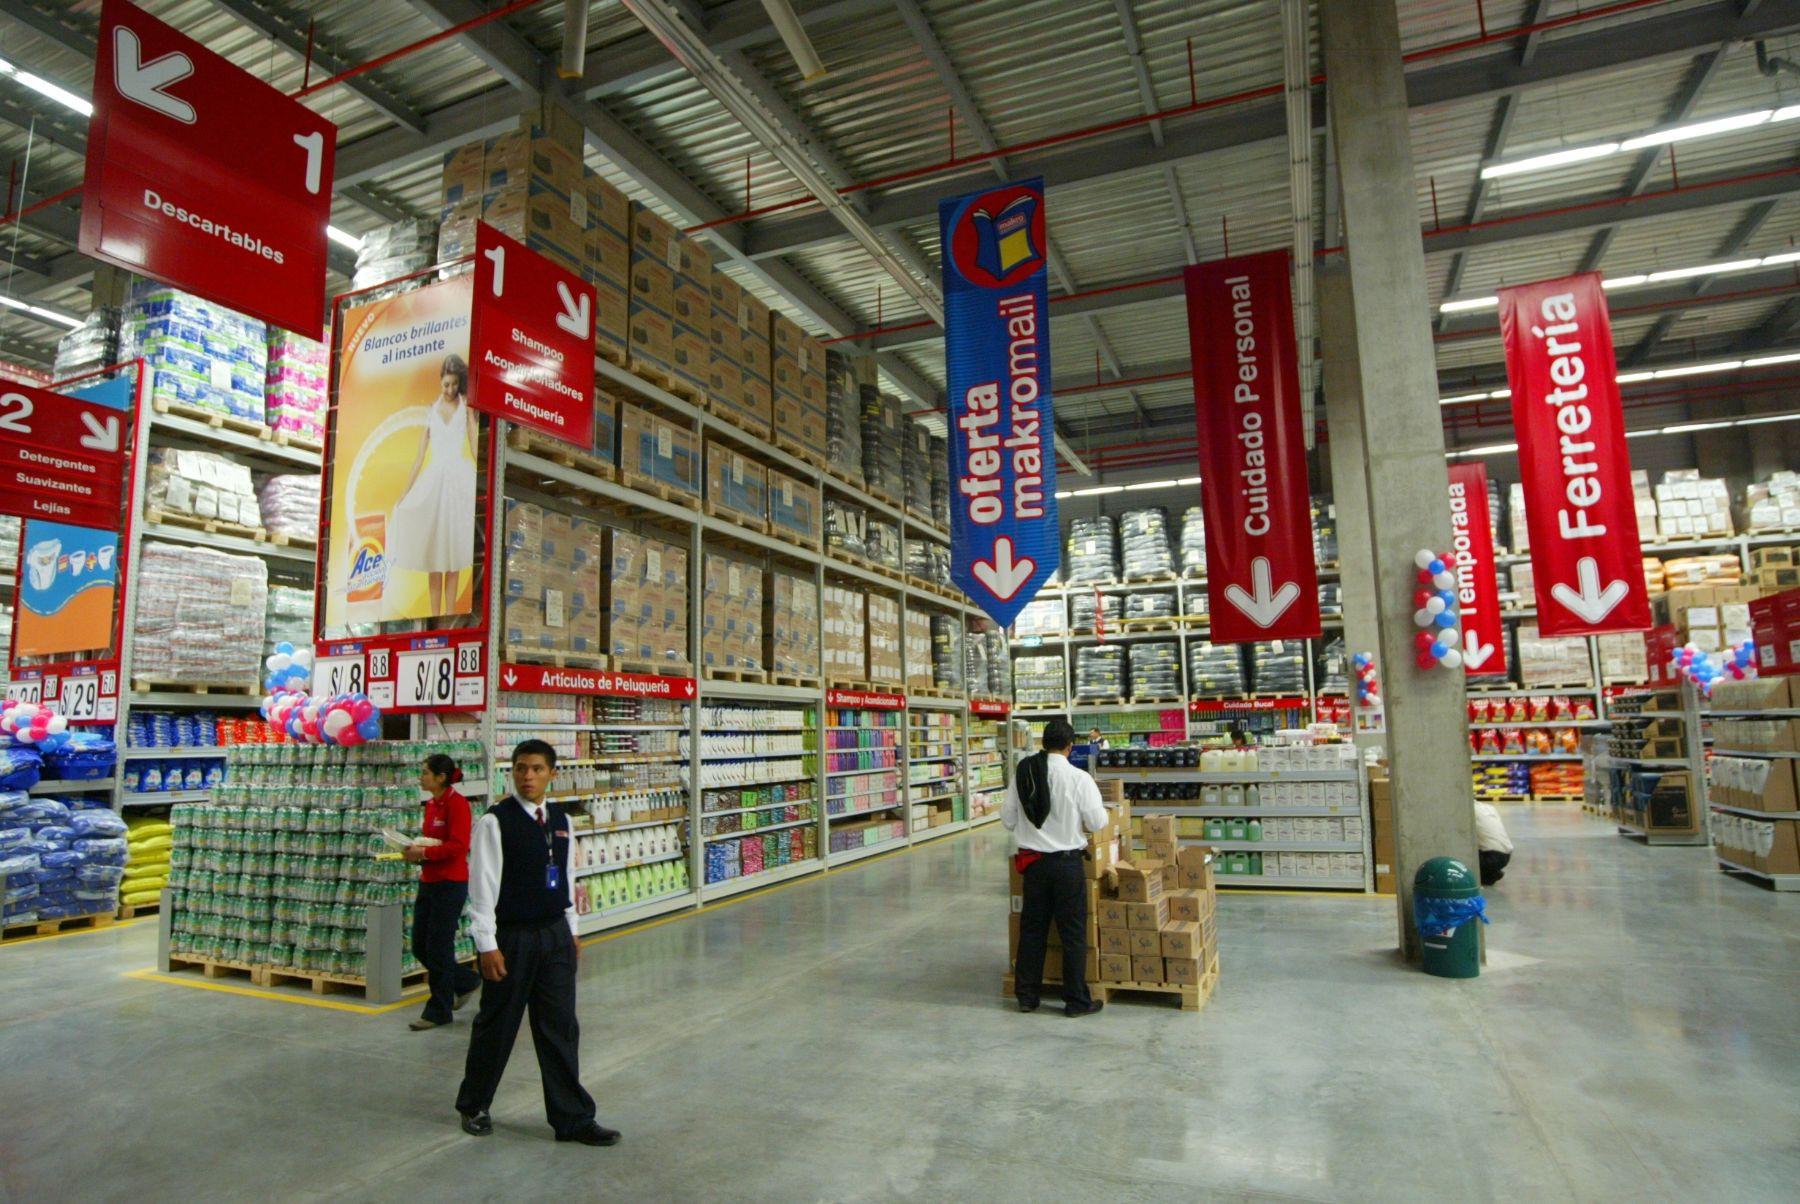 inretail-adquirio-supermercados-makro-por-us360-millones